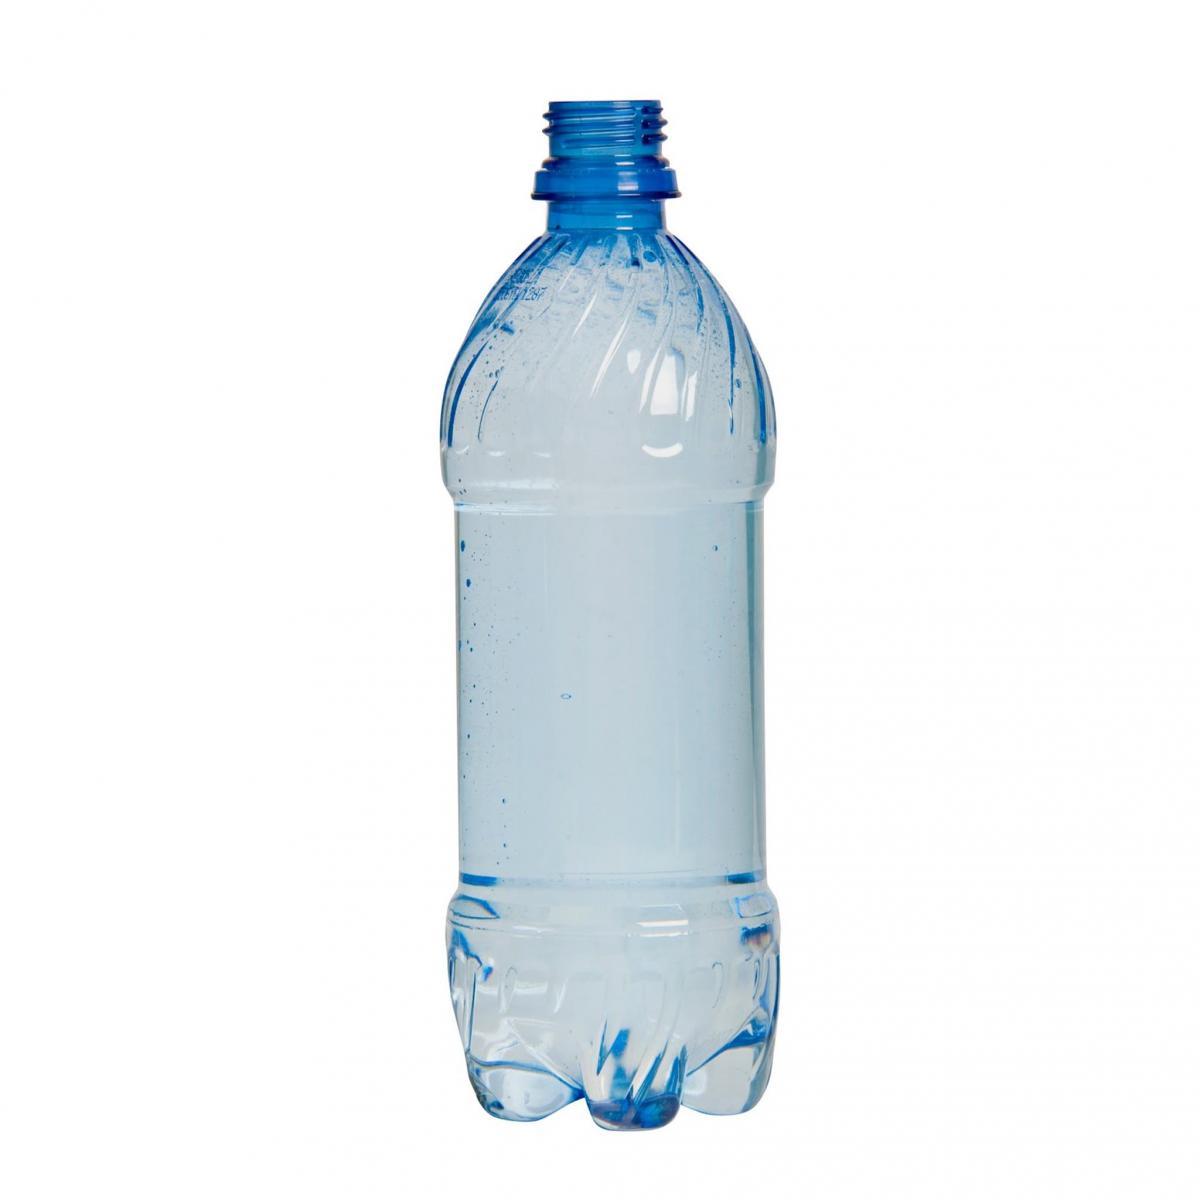 jpg 1200x1200 Plastic bottle cartoon no background - Plastic Bottles PNG